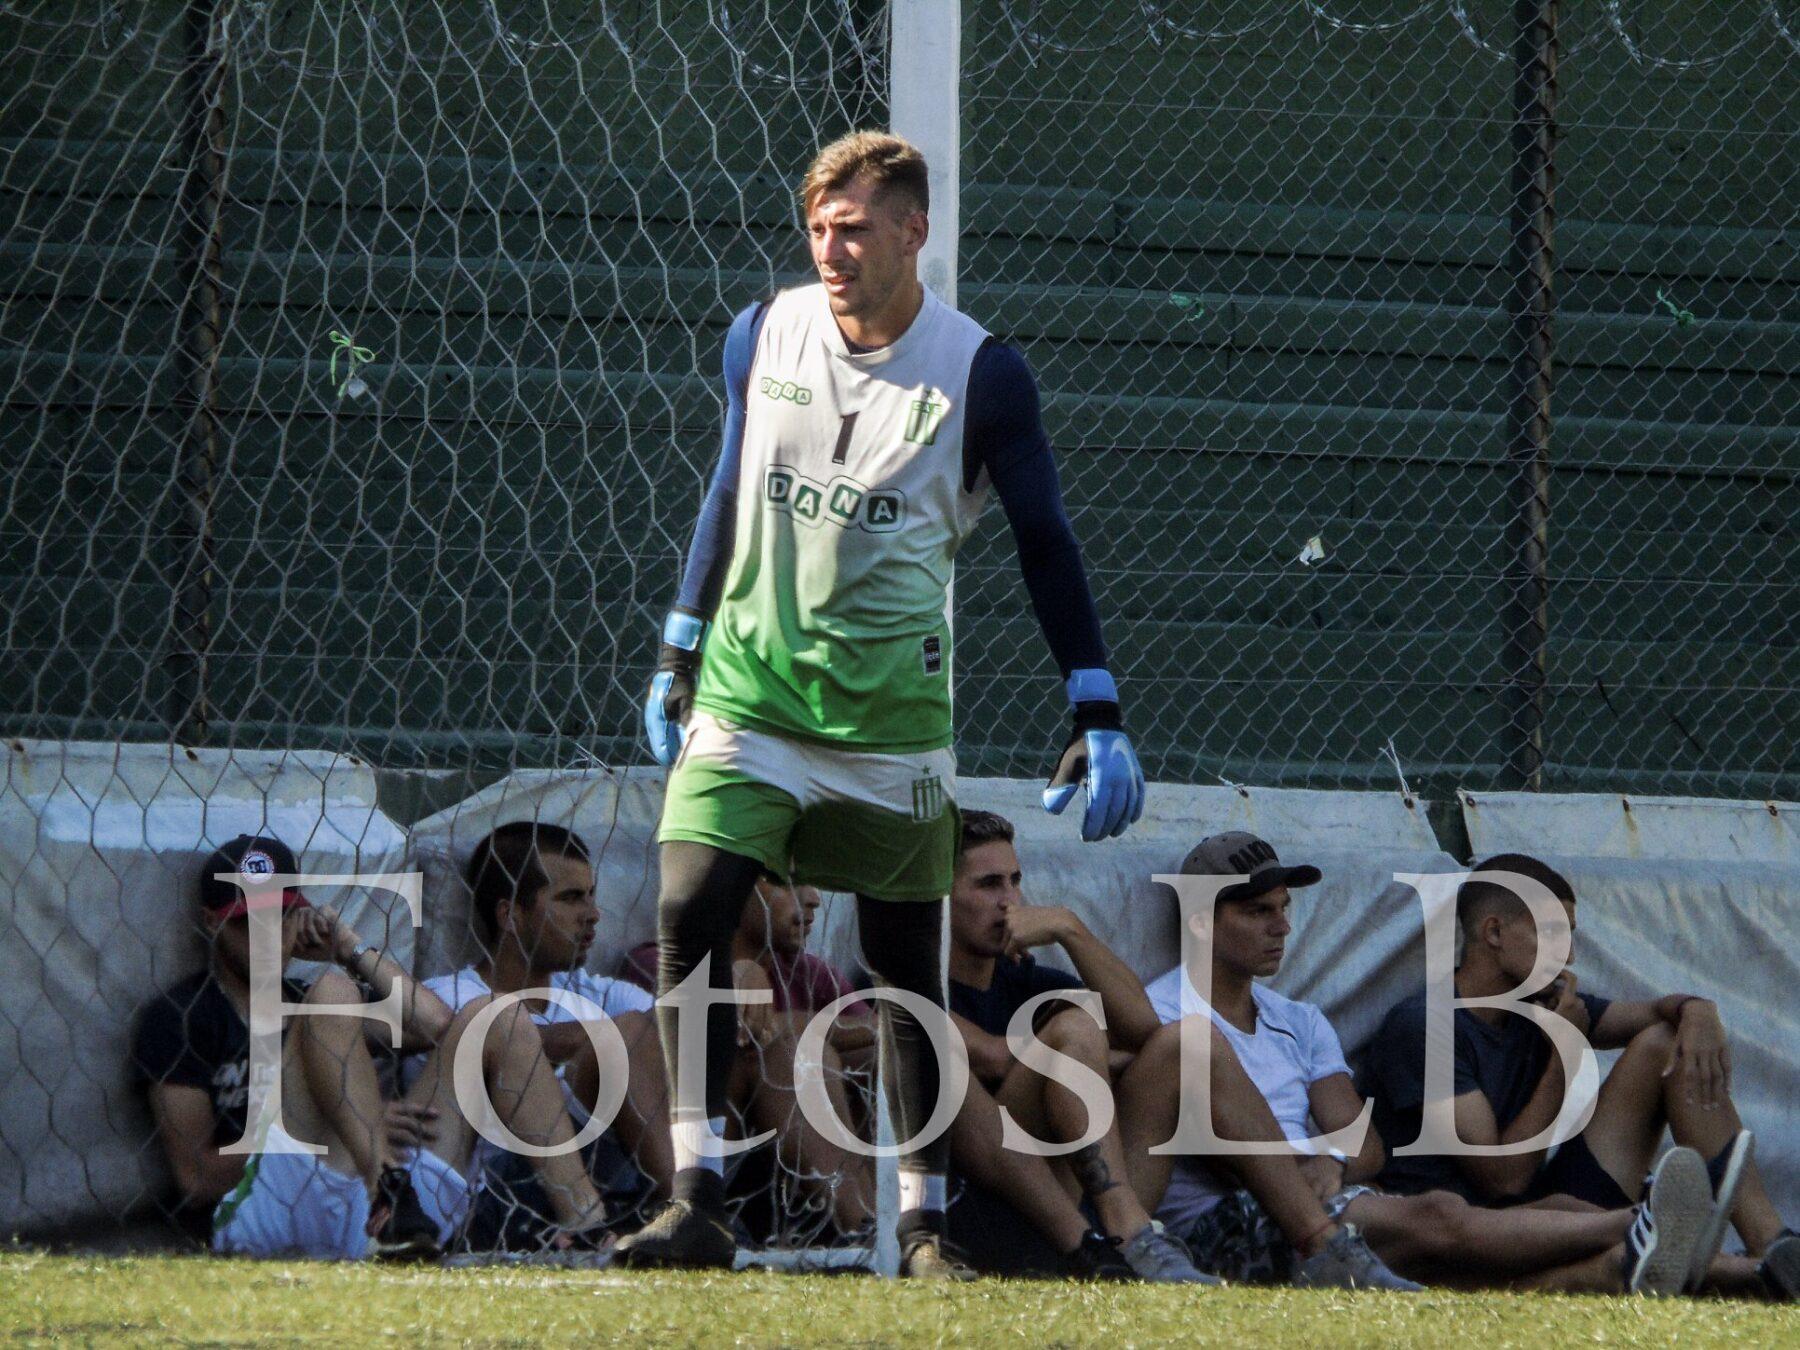 Fútbol de ascenso: Matías Budiño continuará en Excursionistas